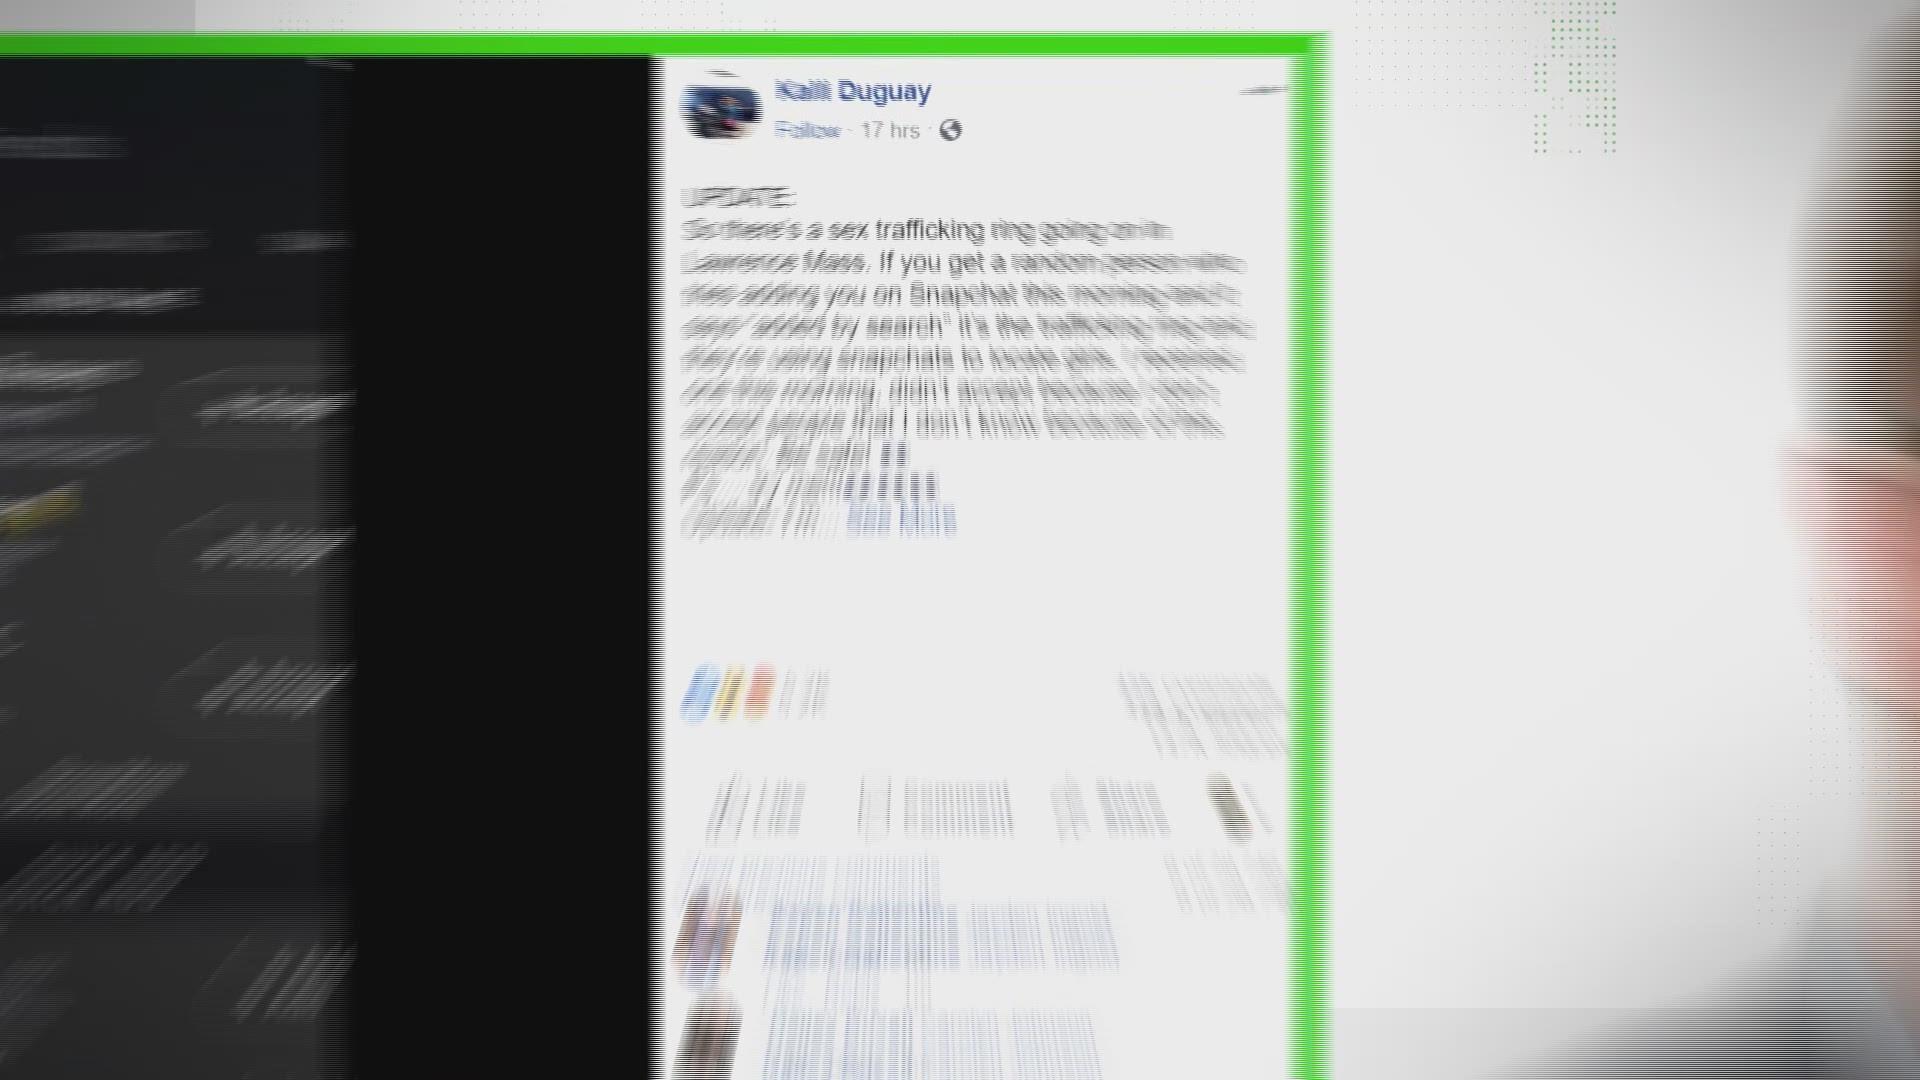 Snapchat sex account